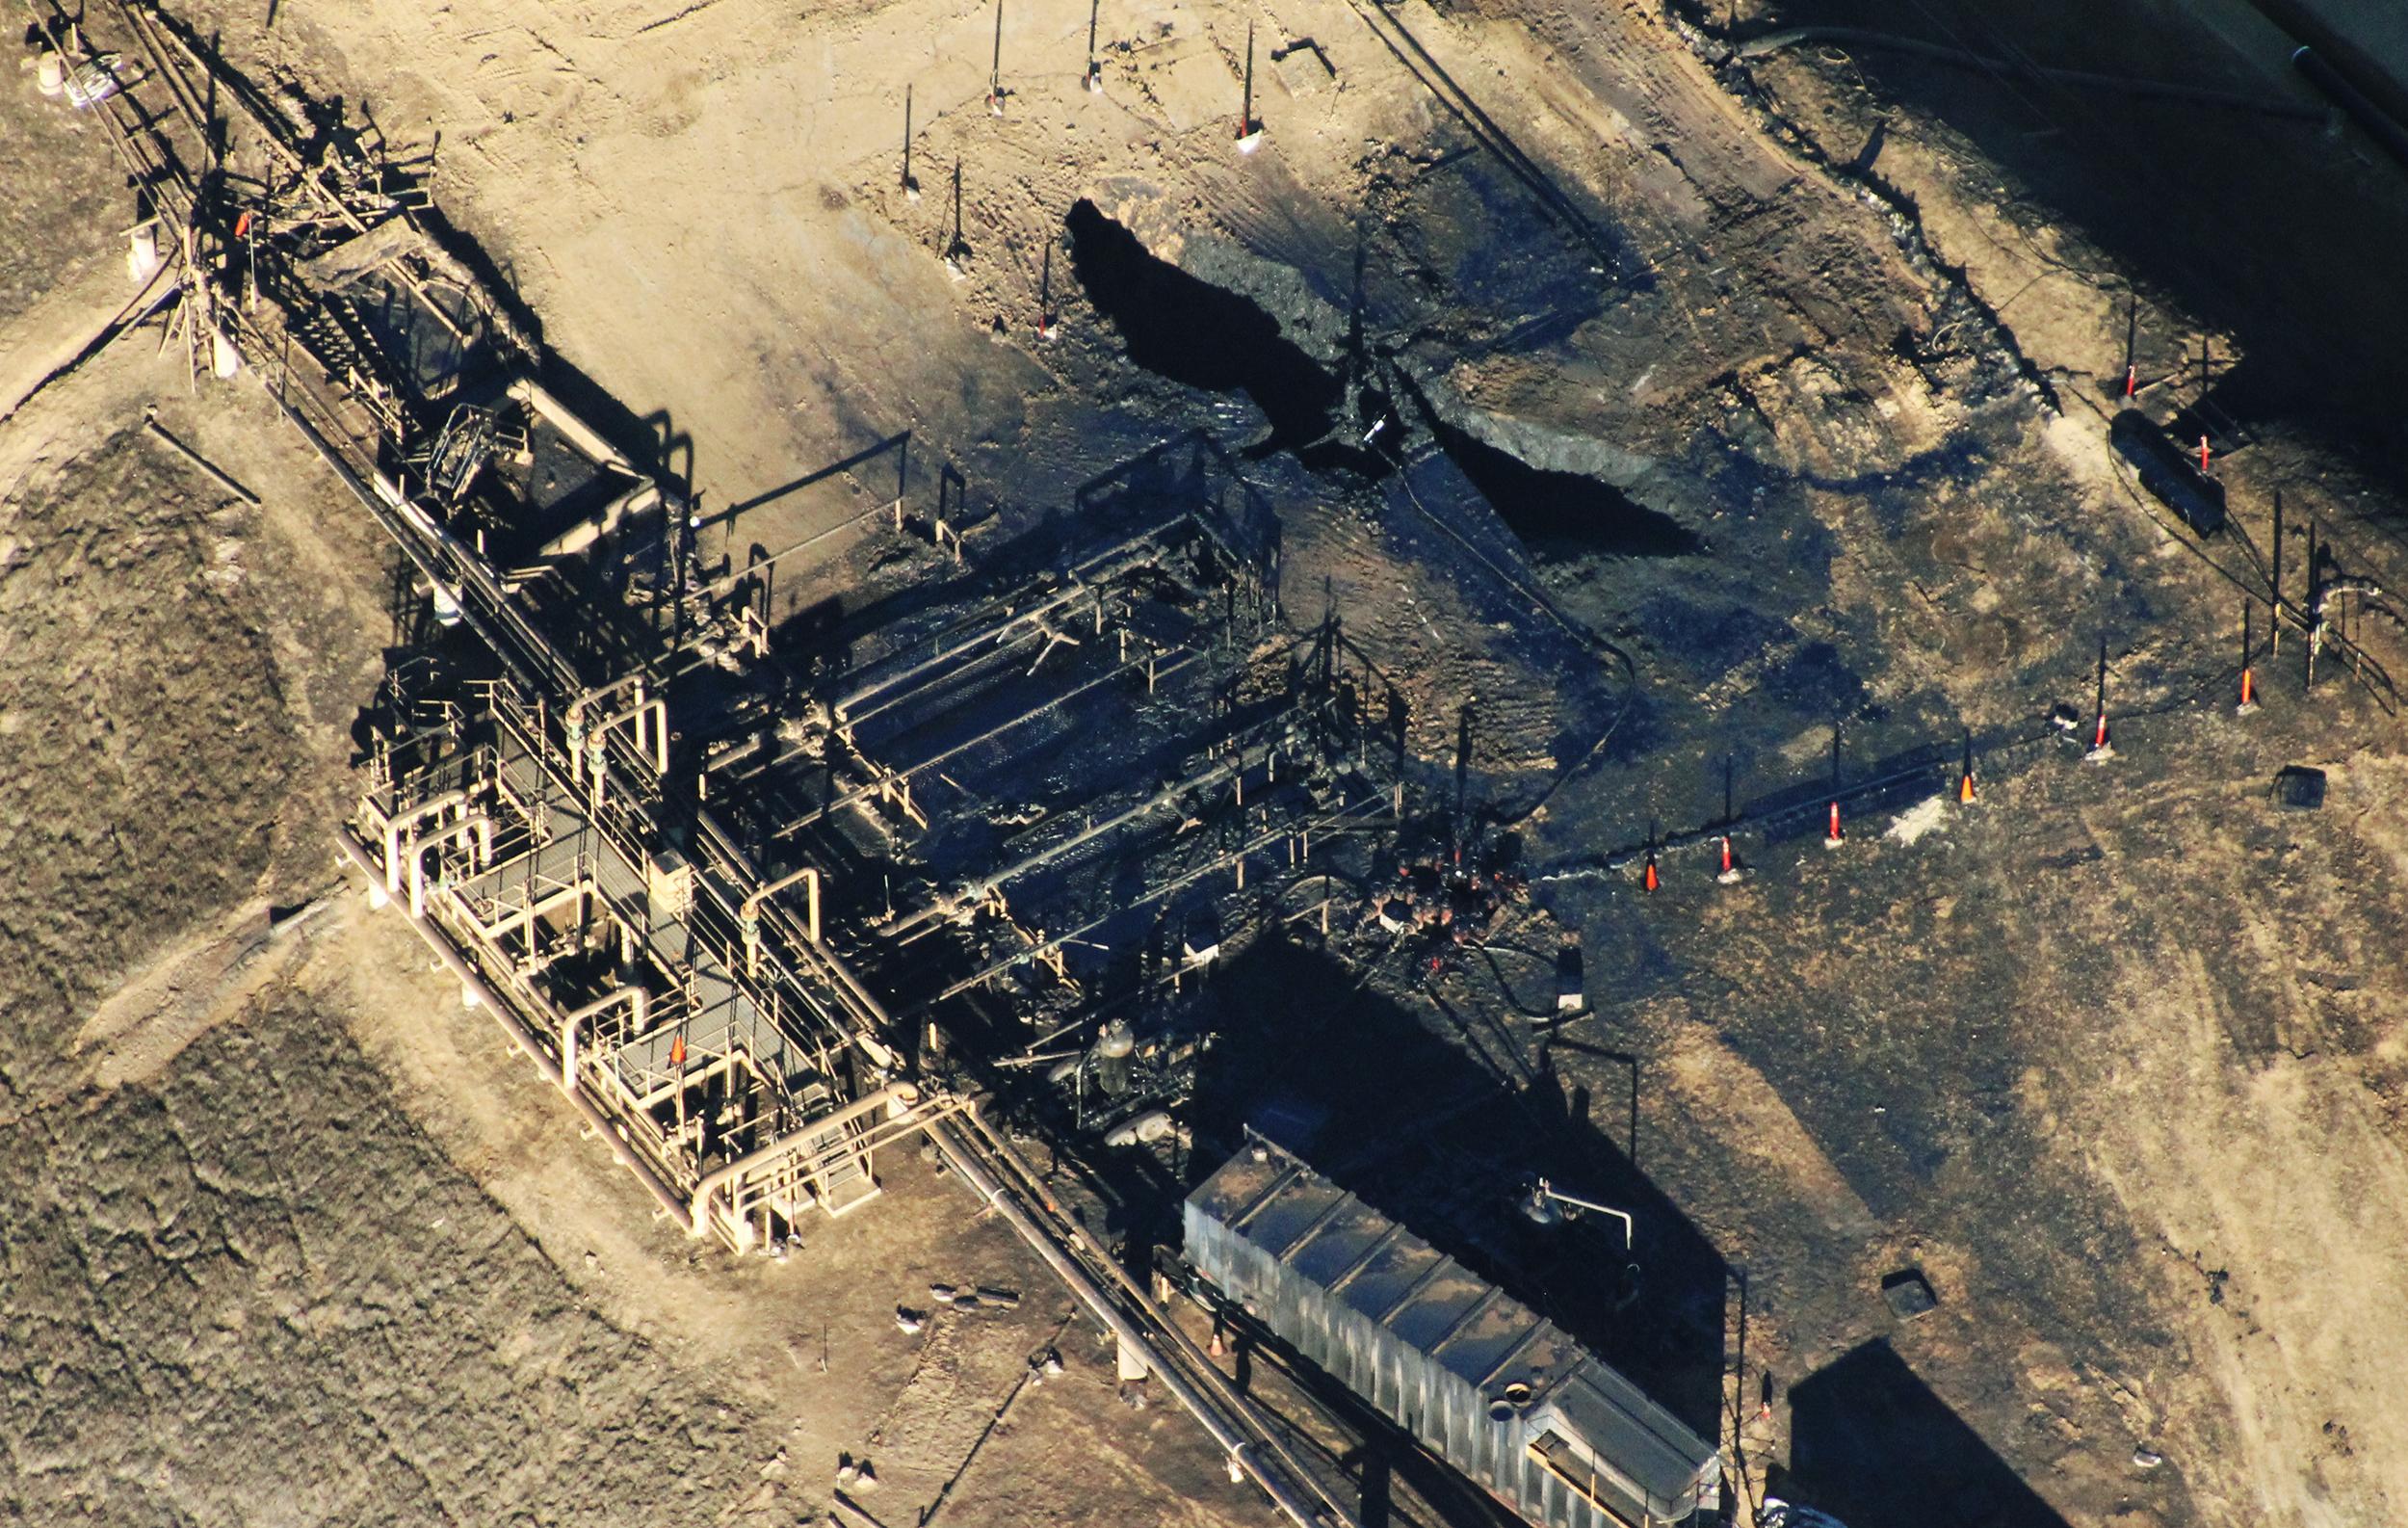 Methane leak explosion